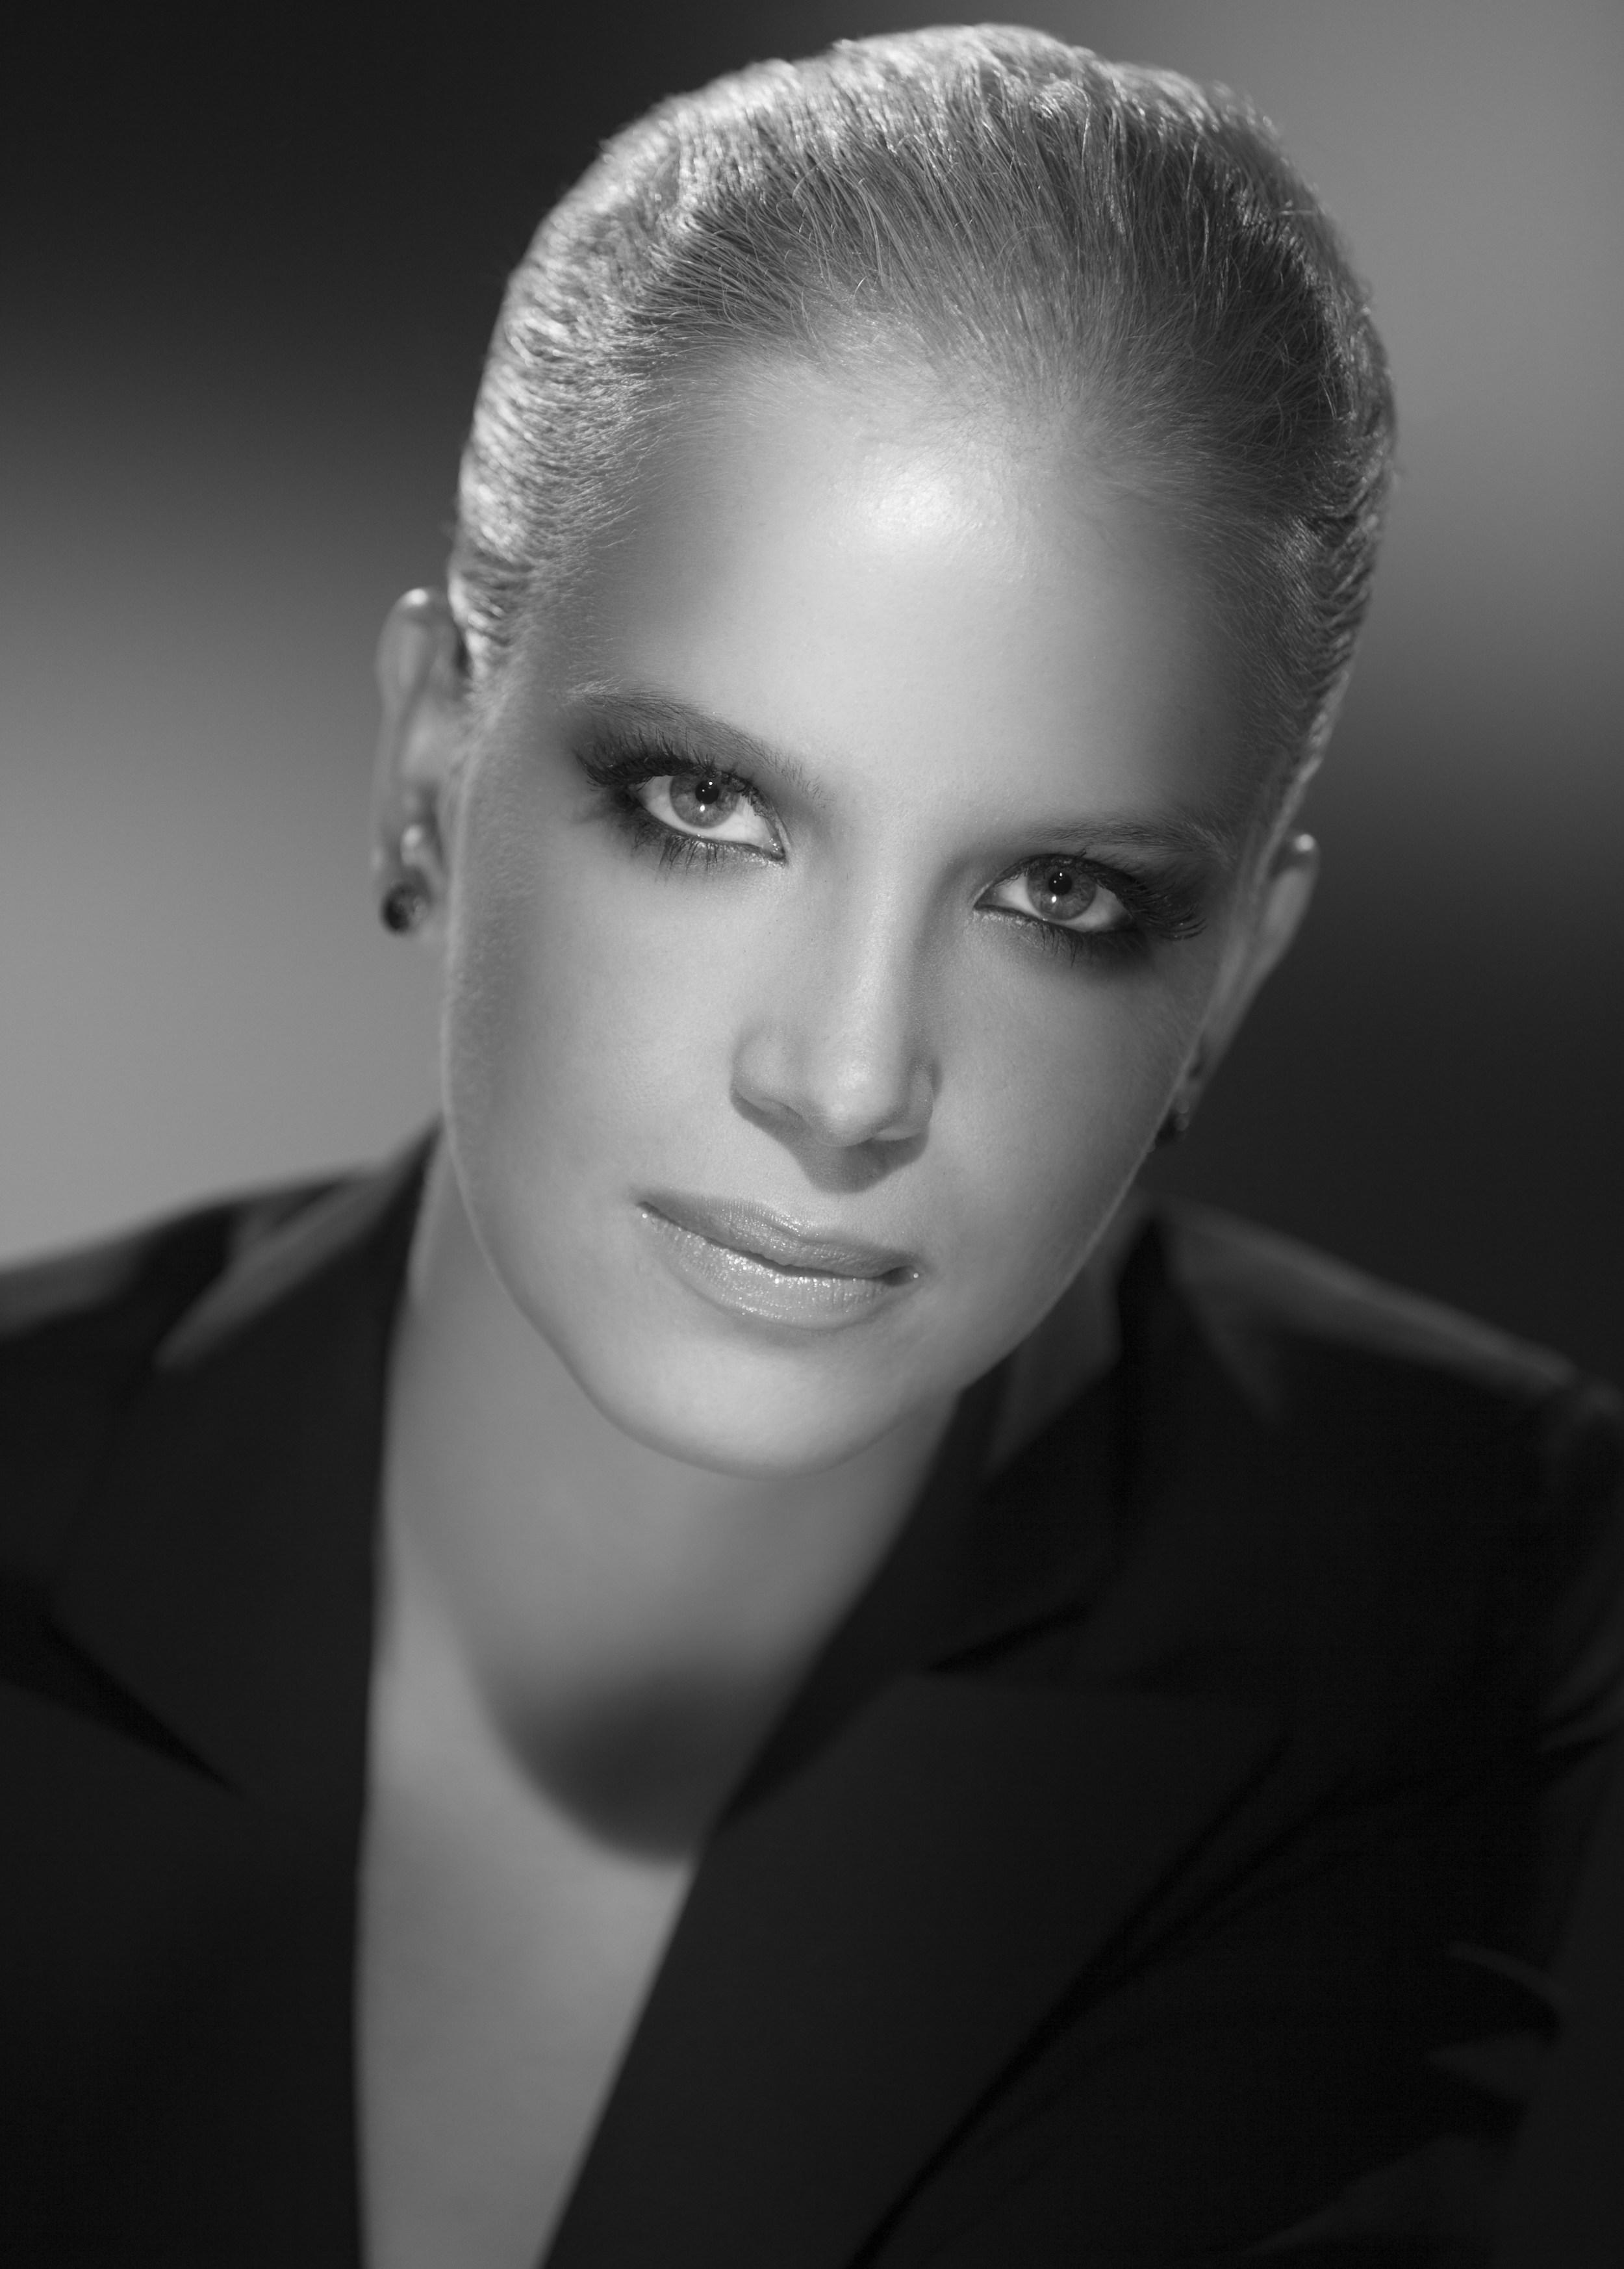 Portraits-5614.jpg